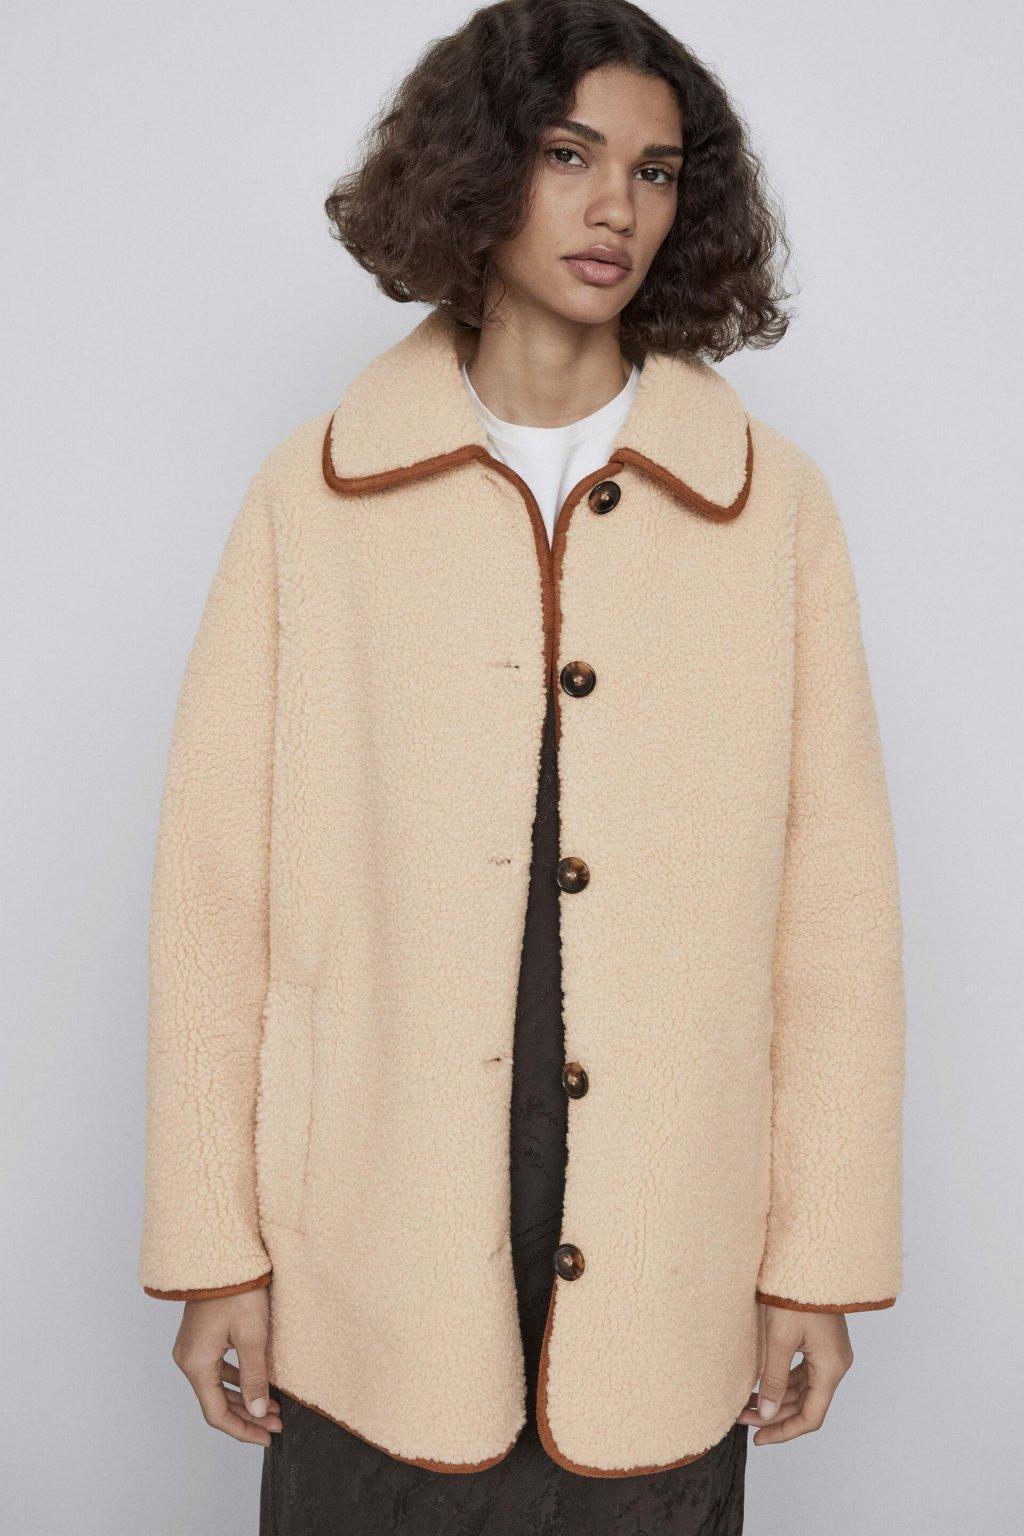 Zara kabátek 0086/086/710